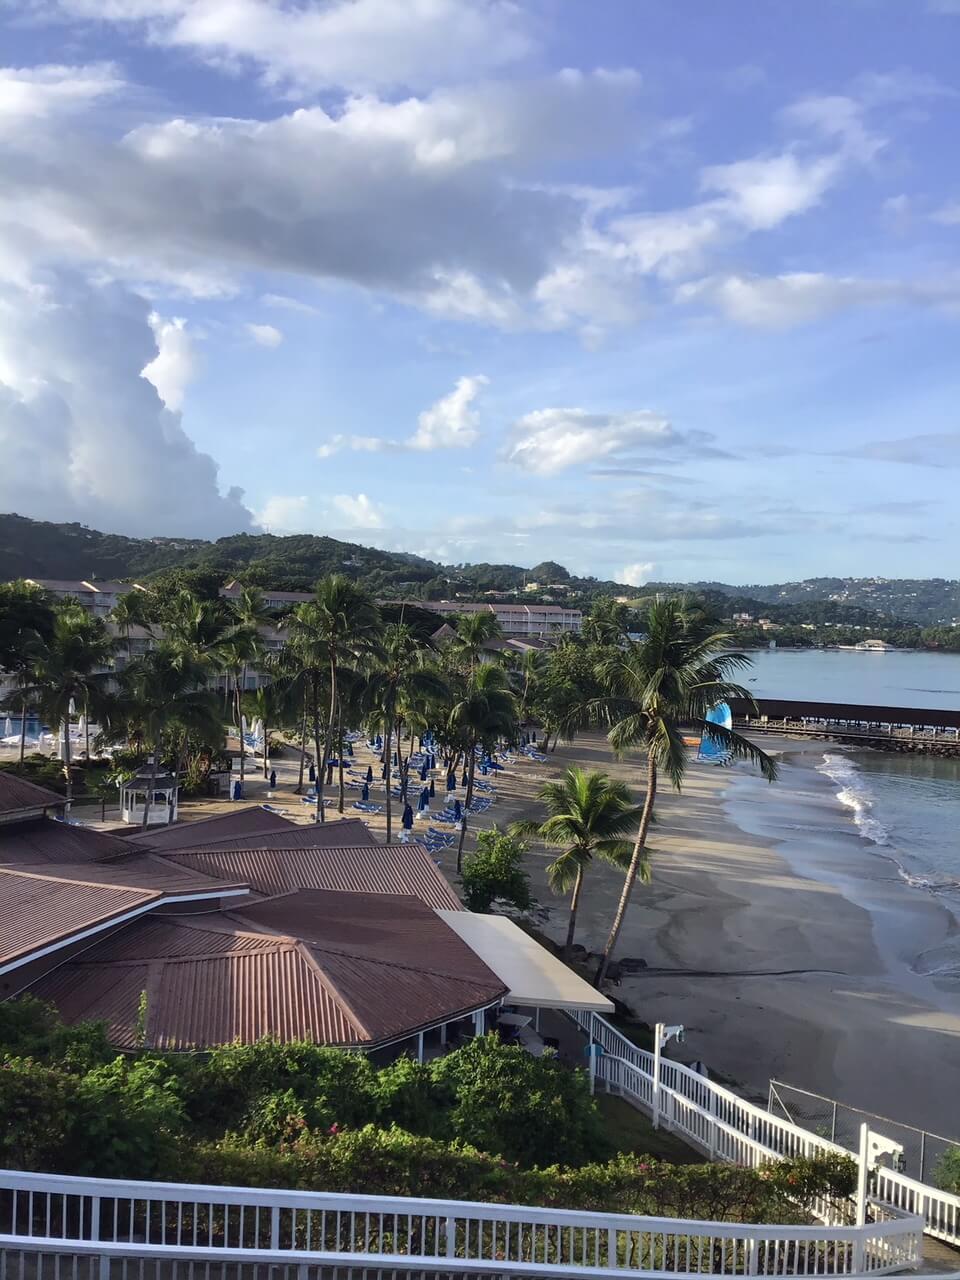 Saint Lucia Police: Strengthening safer tourism